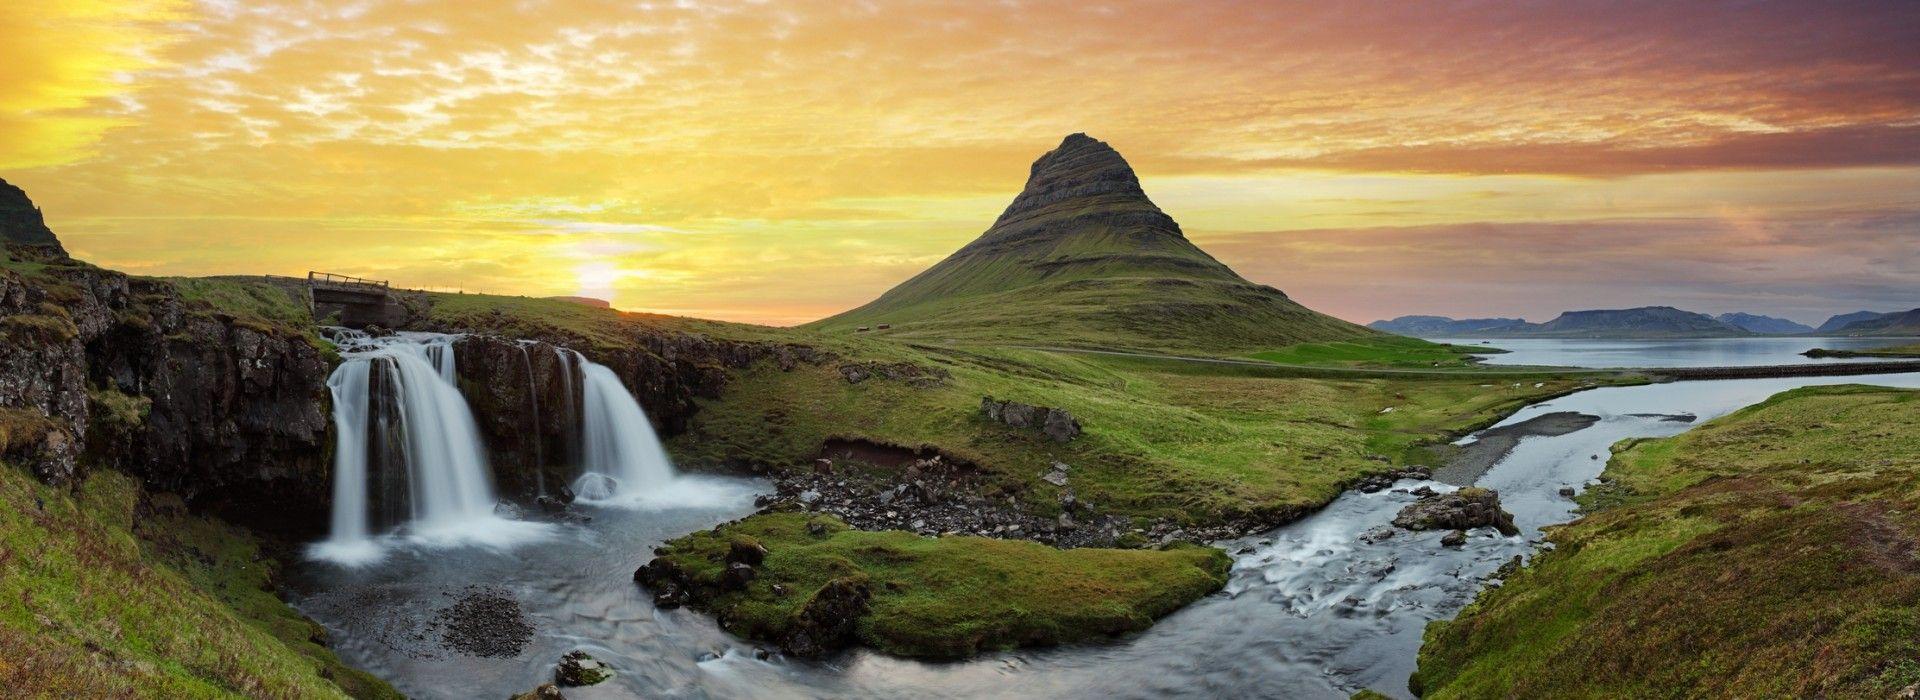 Family Tours in Reykjavik